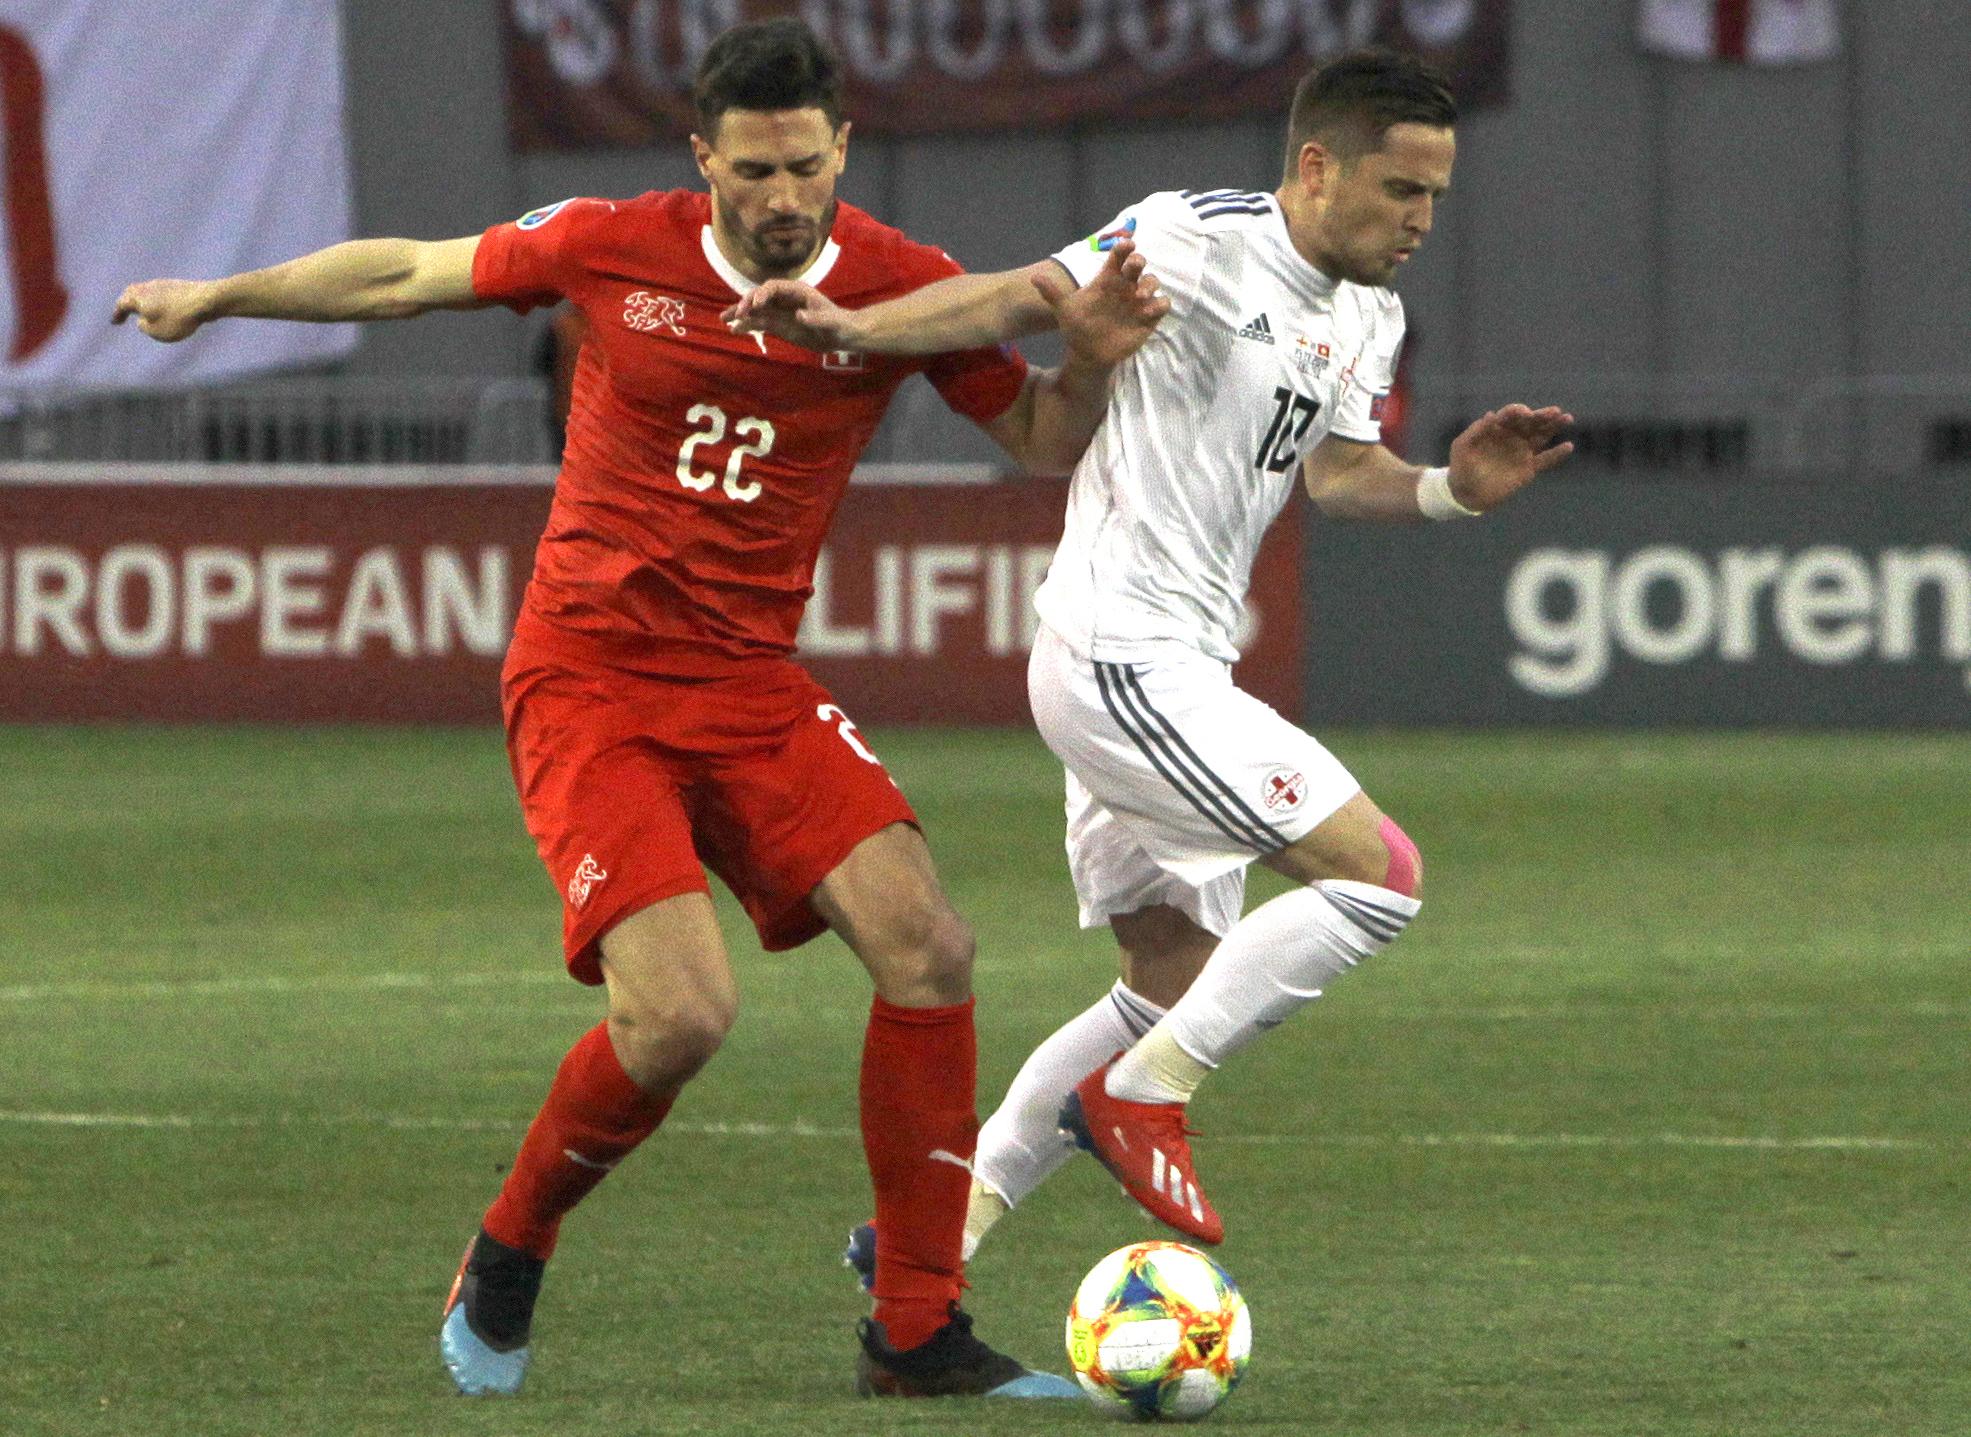 Swiss defender Schar plays on after severe head knock